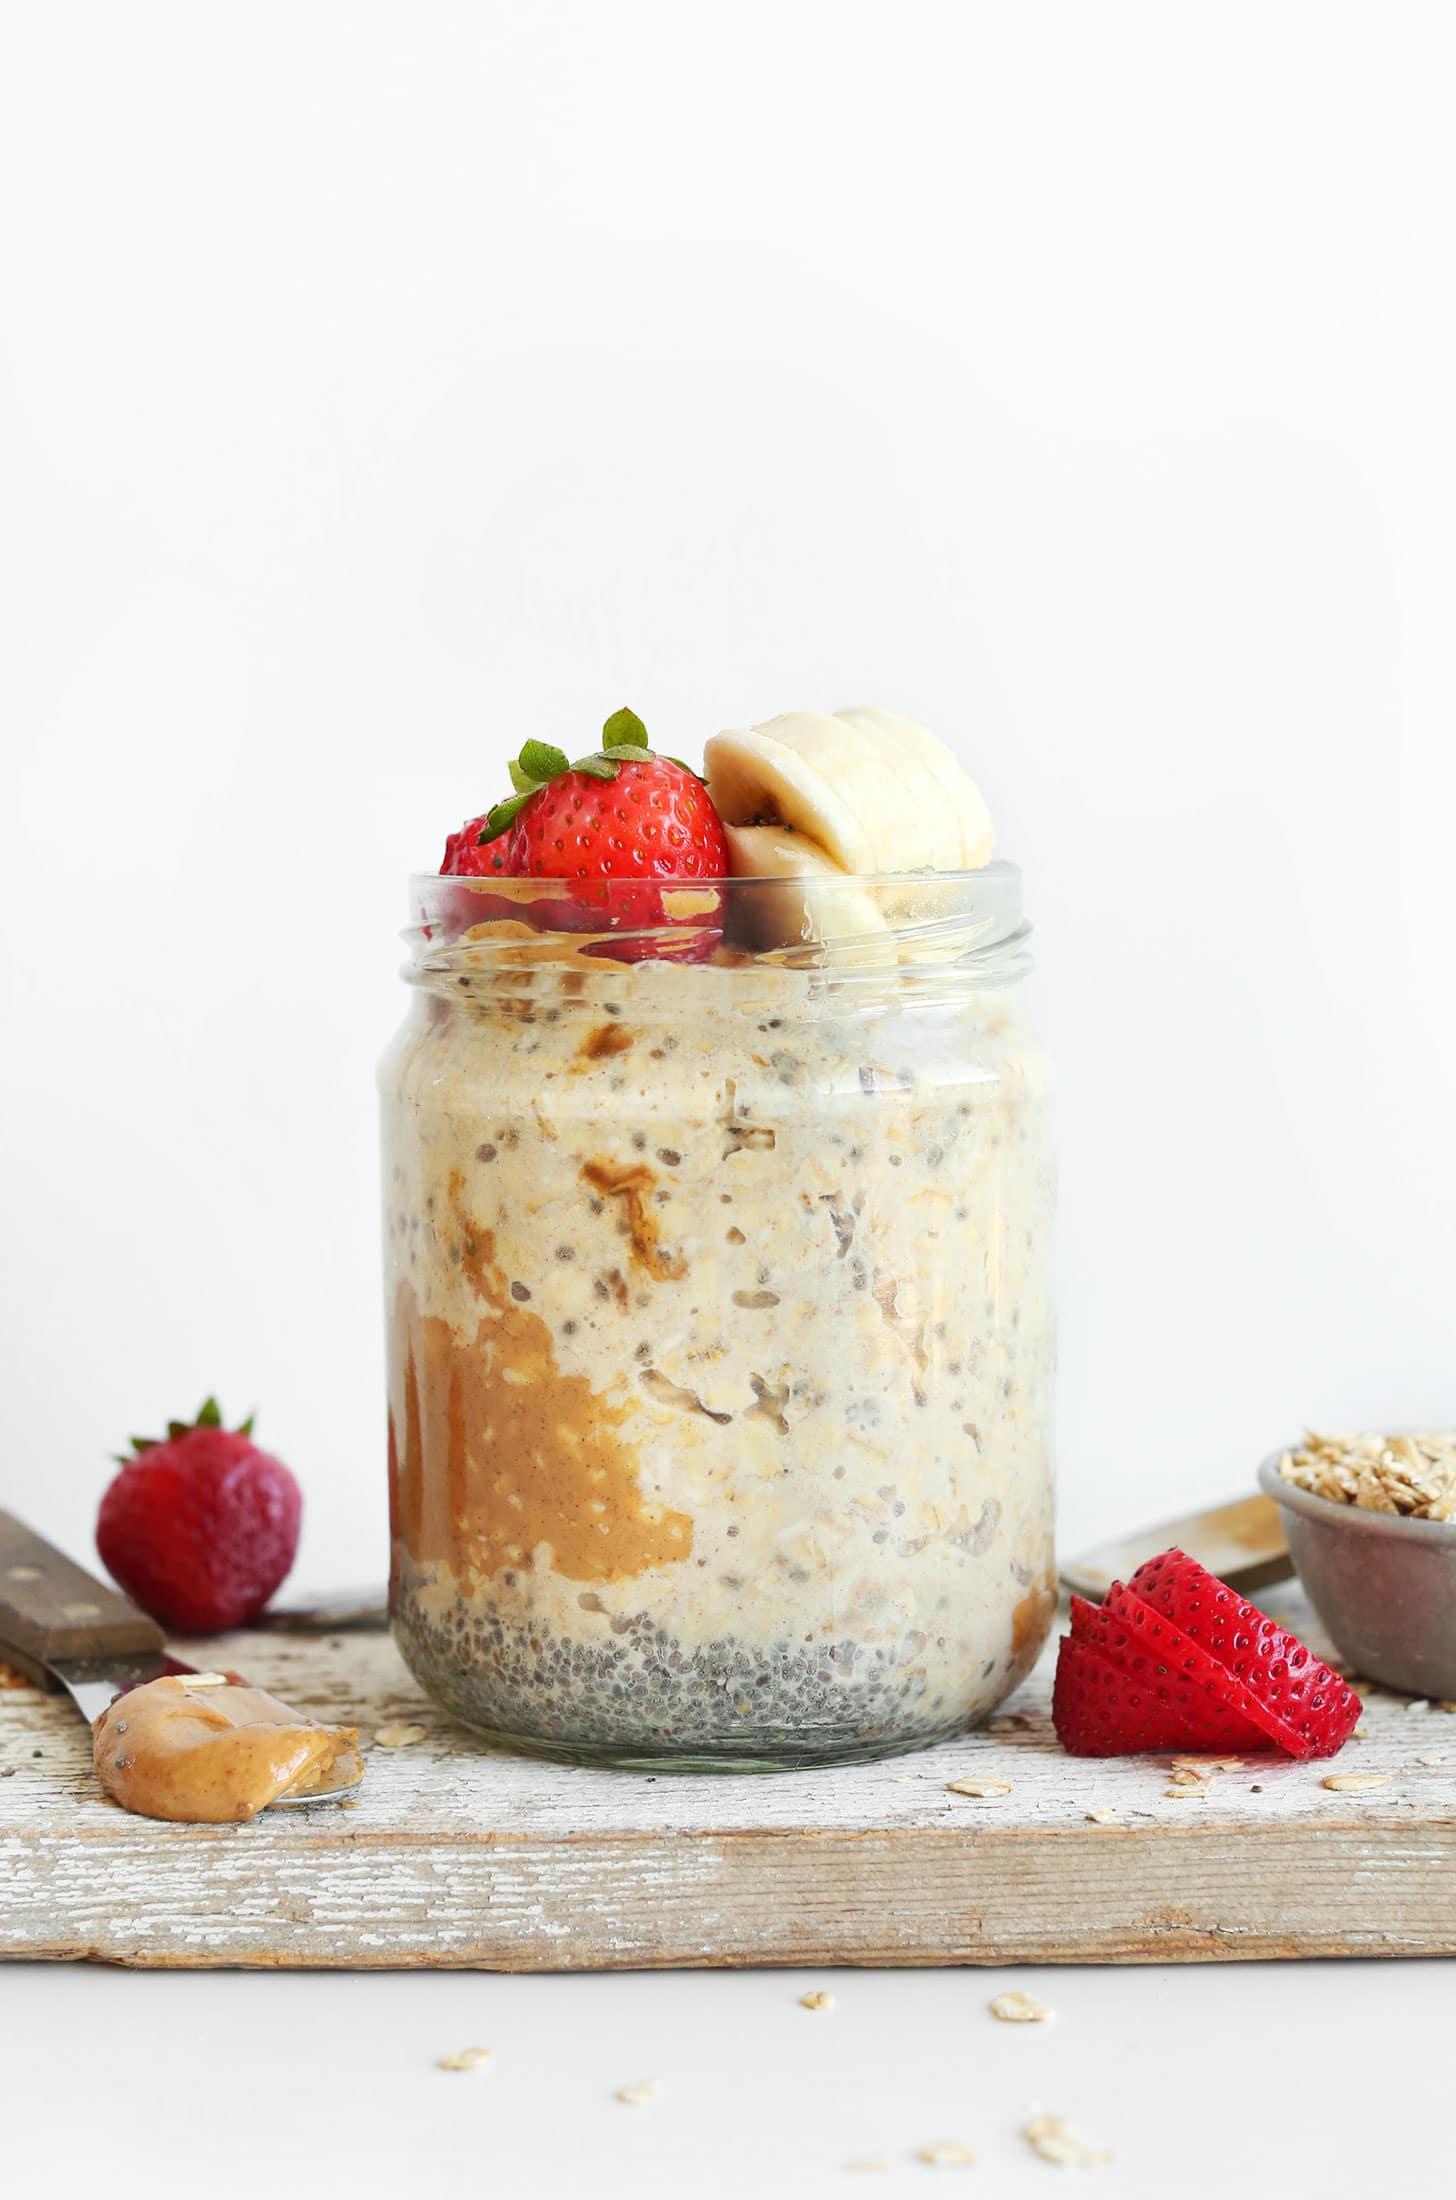 Peanut Butter Overnight Oats from minimalistbaker.com on foodiecrush.com